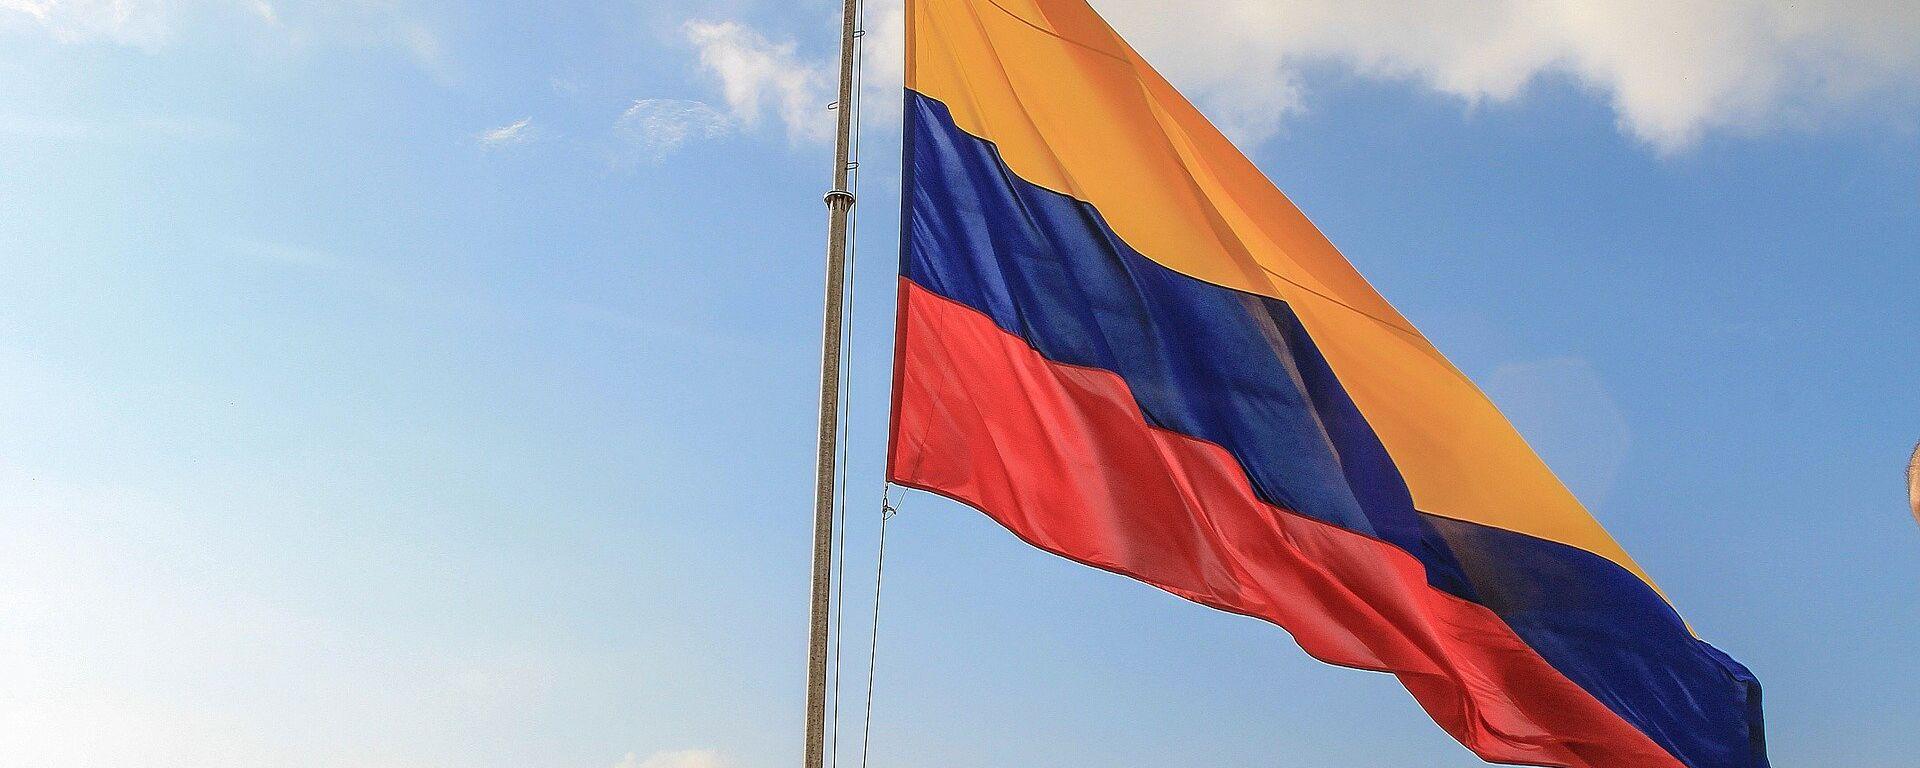 Bandera de Colombia - Sputnik Mundo, 1920, 07.05.2021